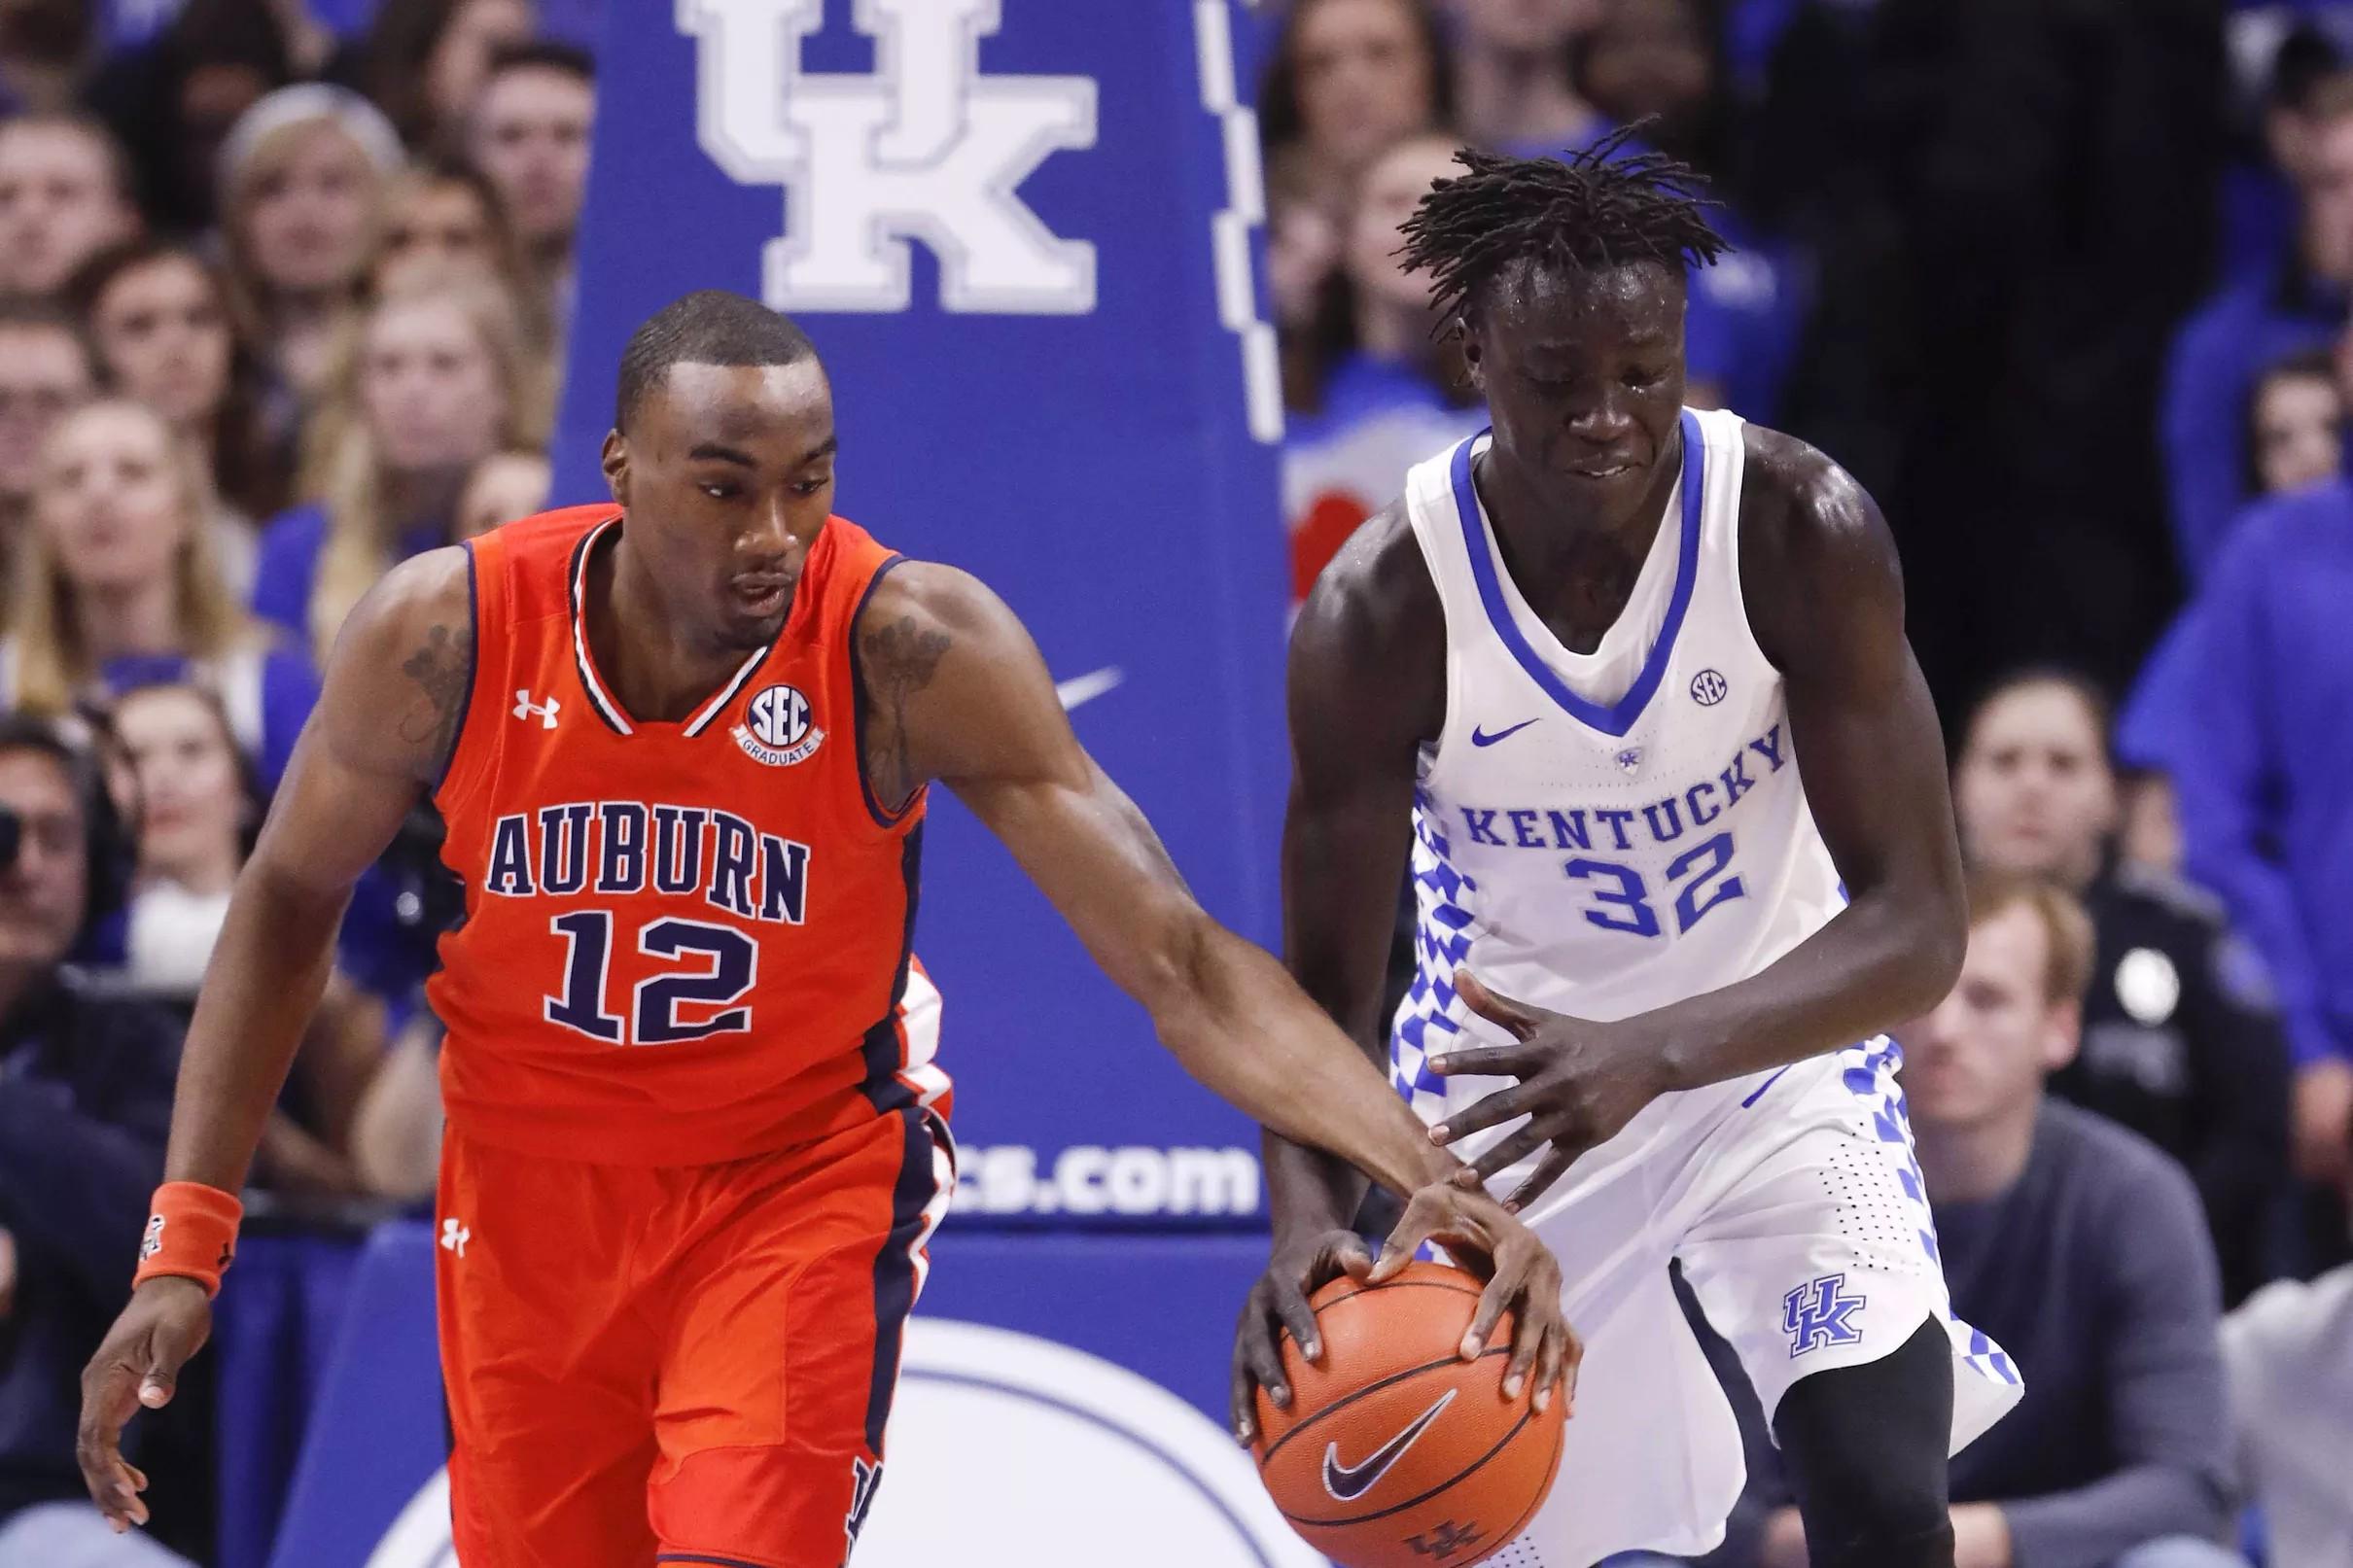 Kentucky Wildcats Basketball vs Auburn Tigers: Game time, TV